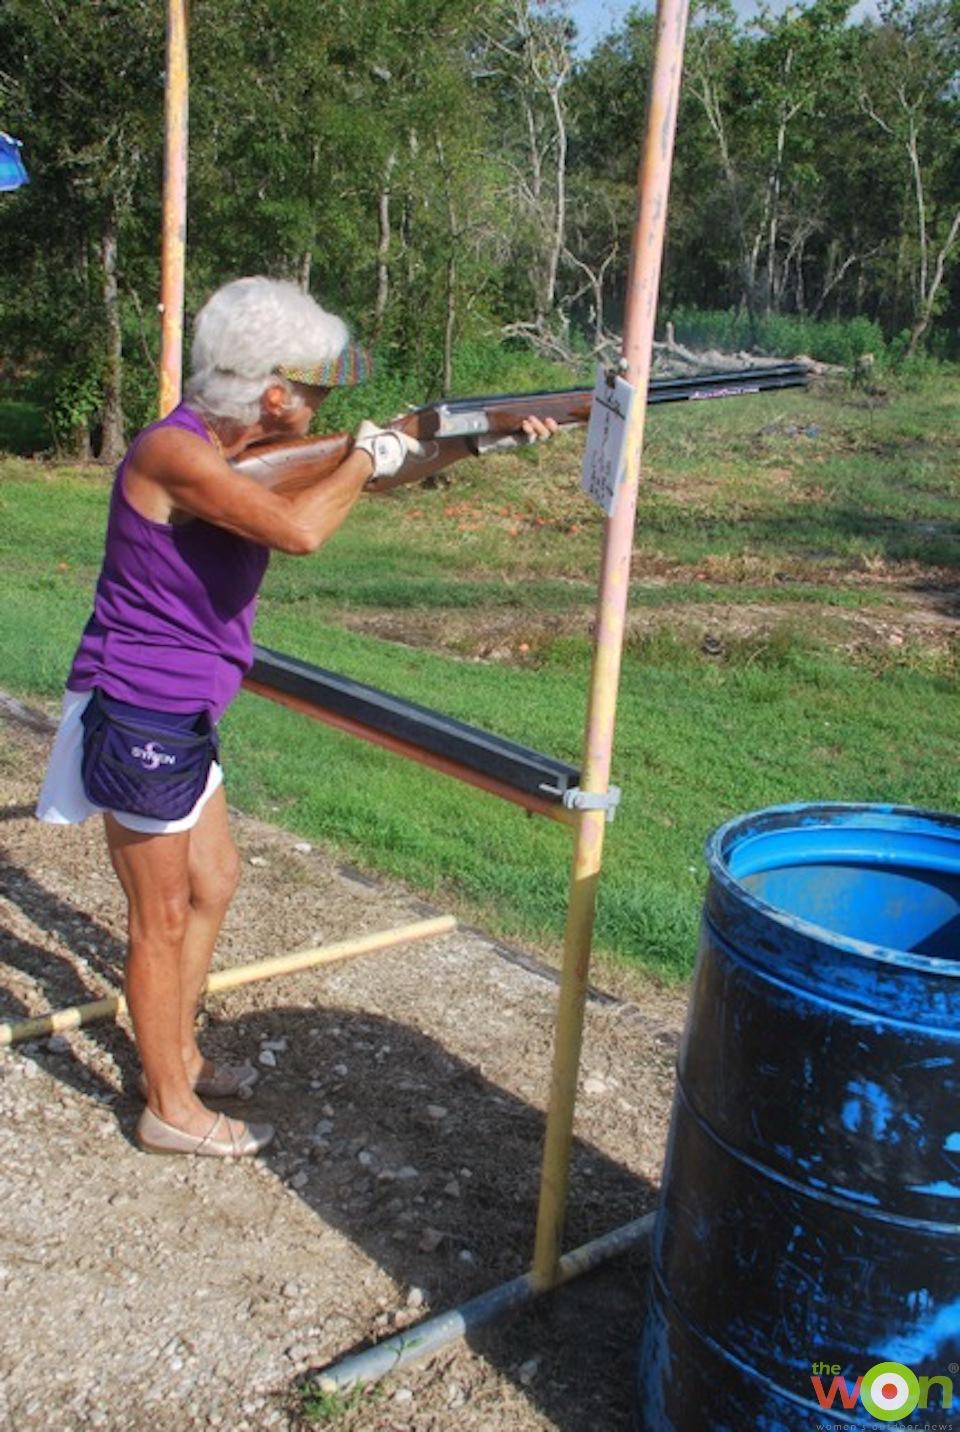 BGarney shooting2 Barbara Garney